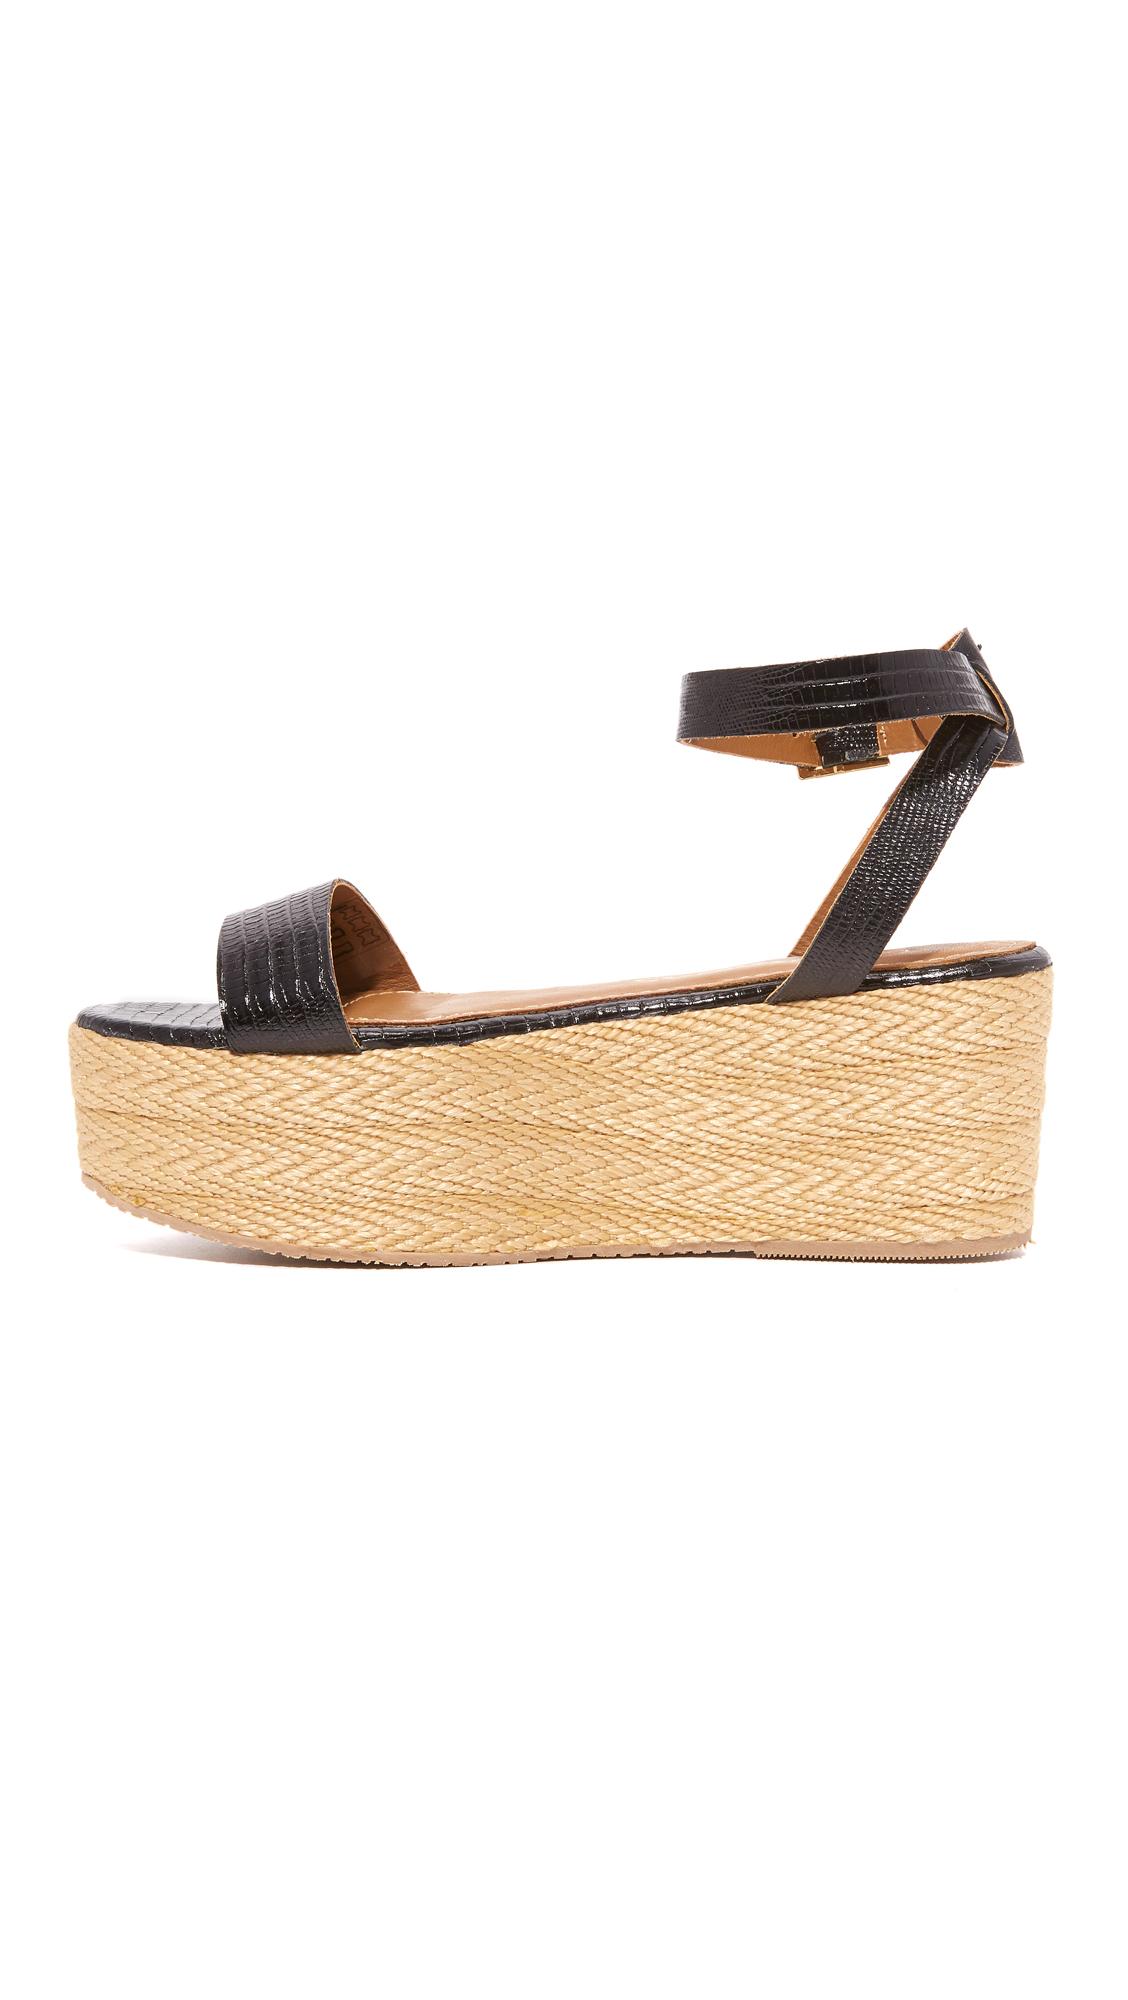 b944a75eecc KAANAS Seshat Platform Espadrille Sandals